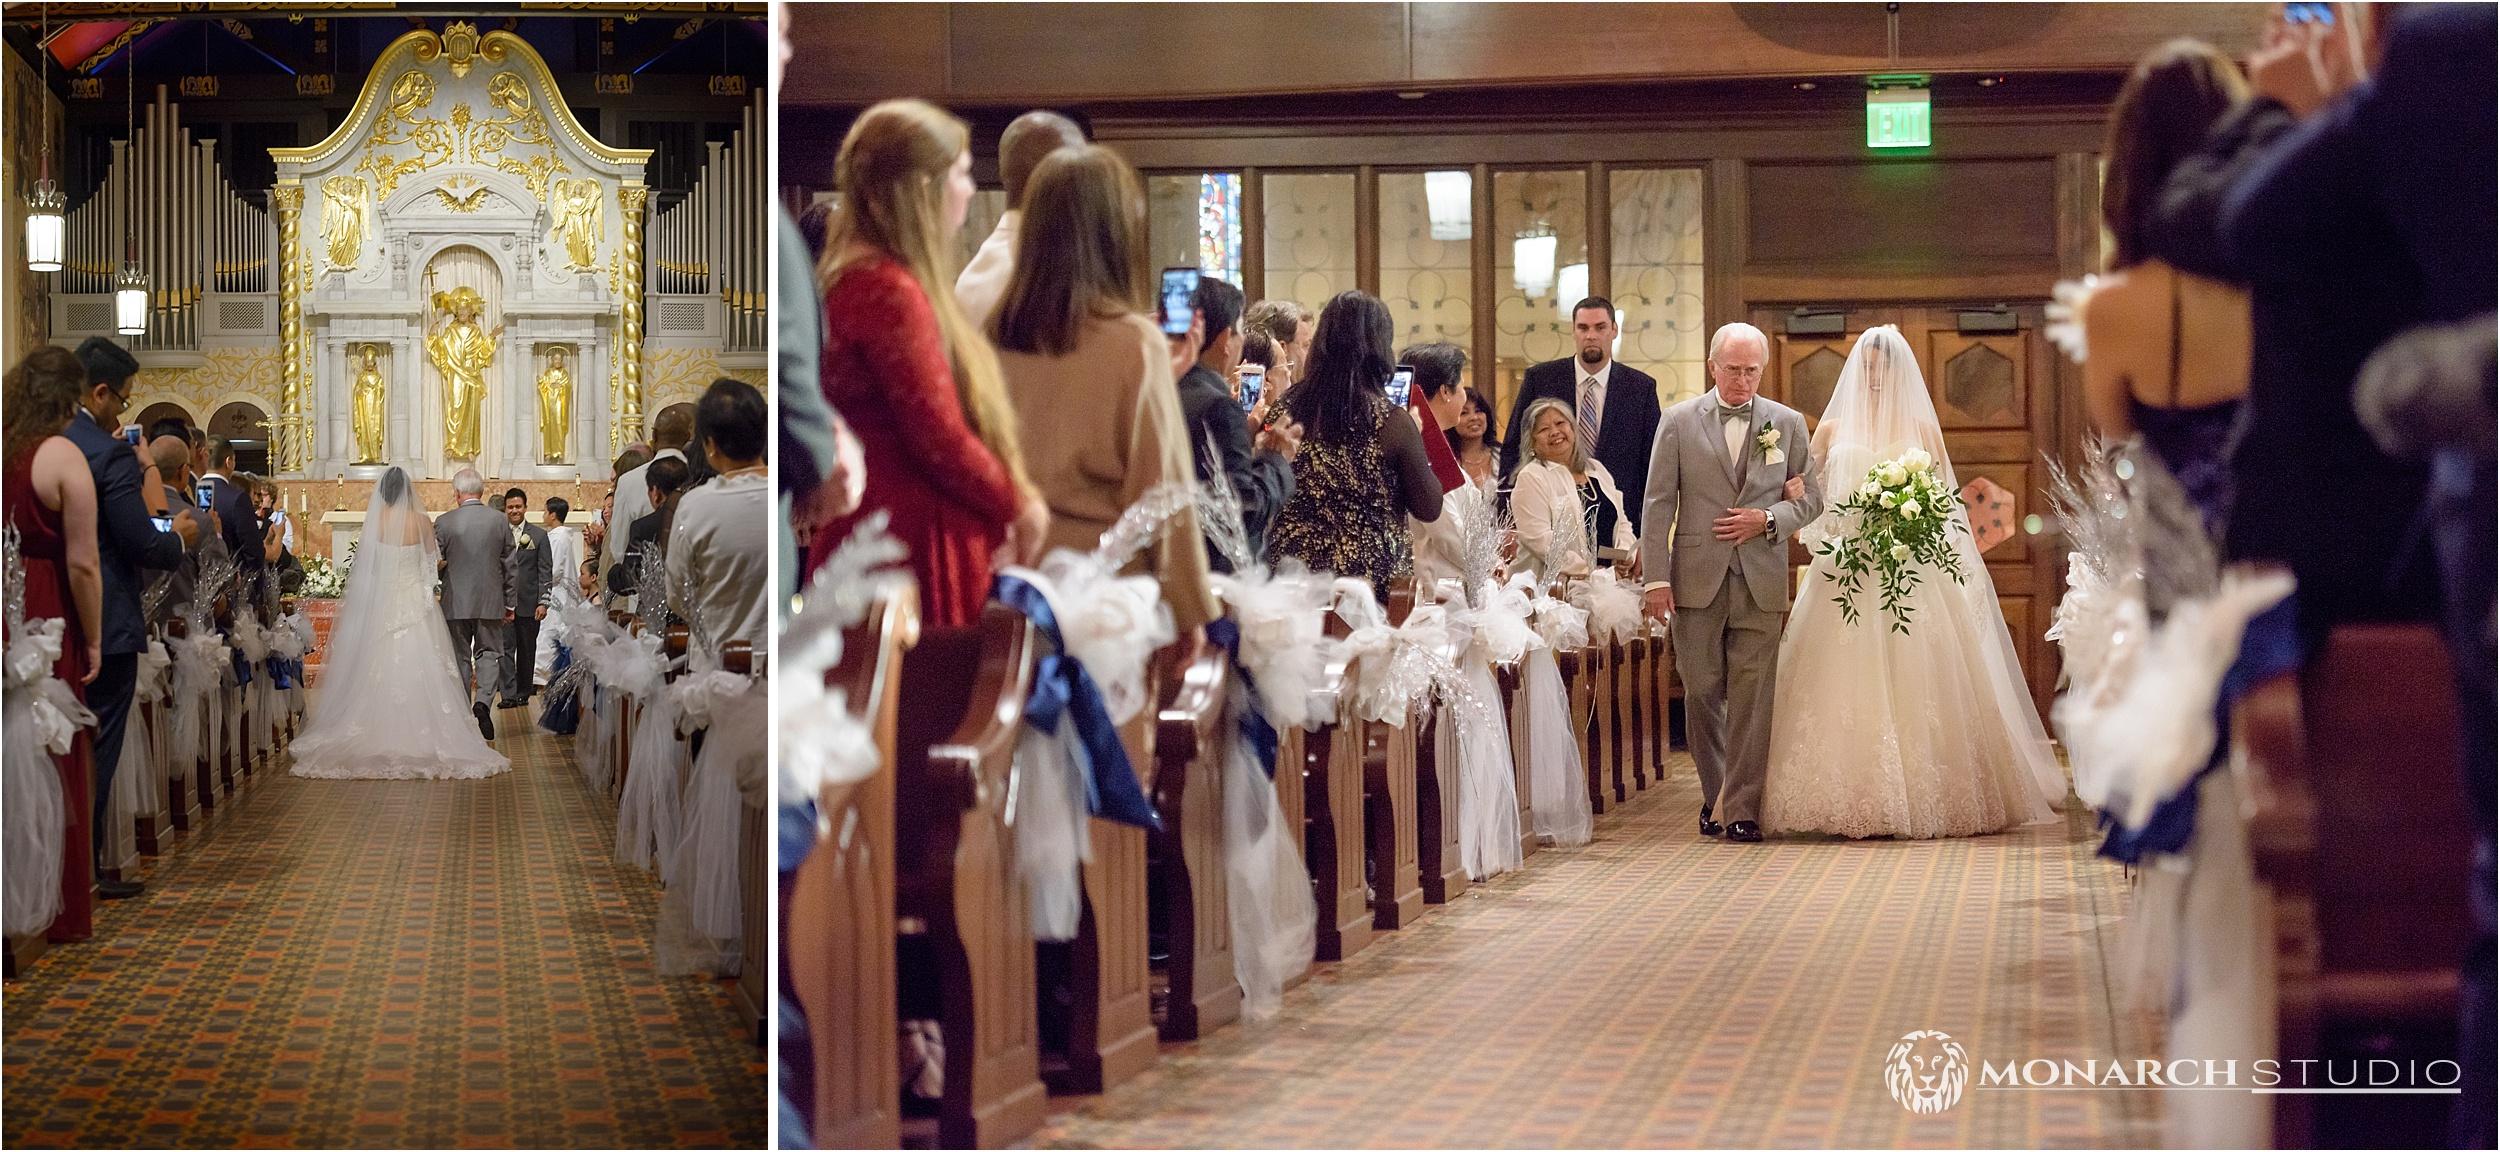 wedding-photographer-in-st-augustine-florida-treasury-035.jpg